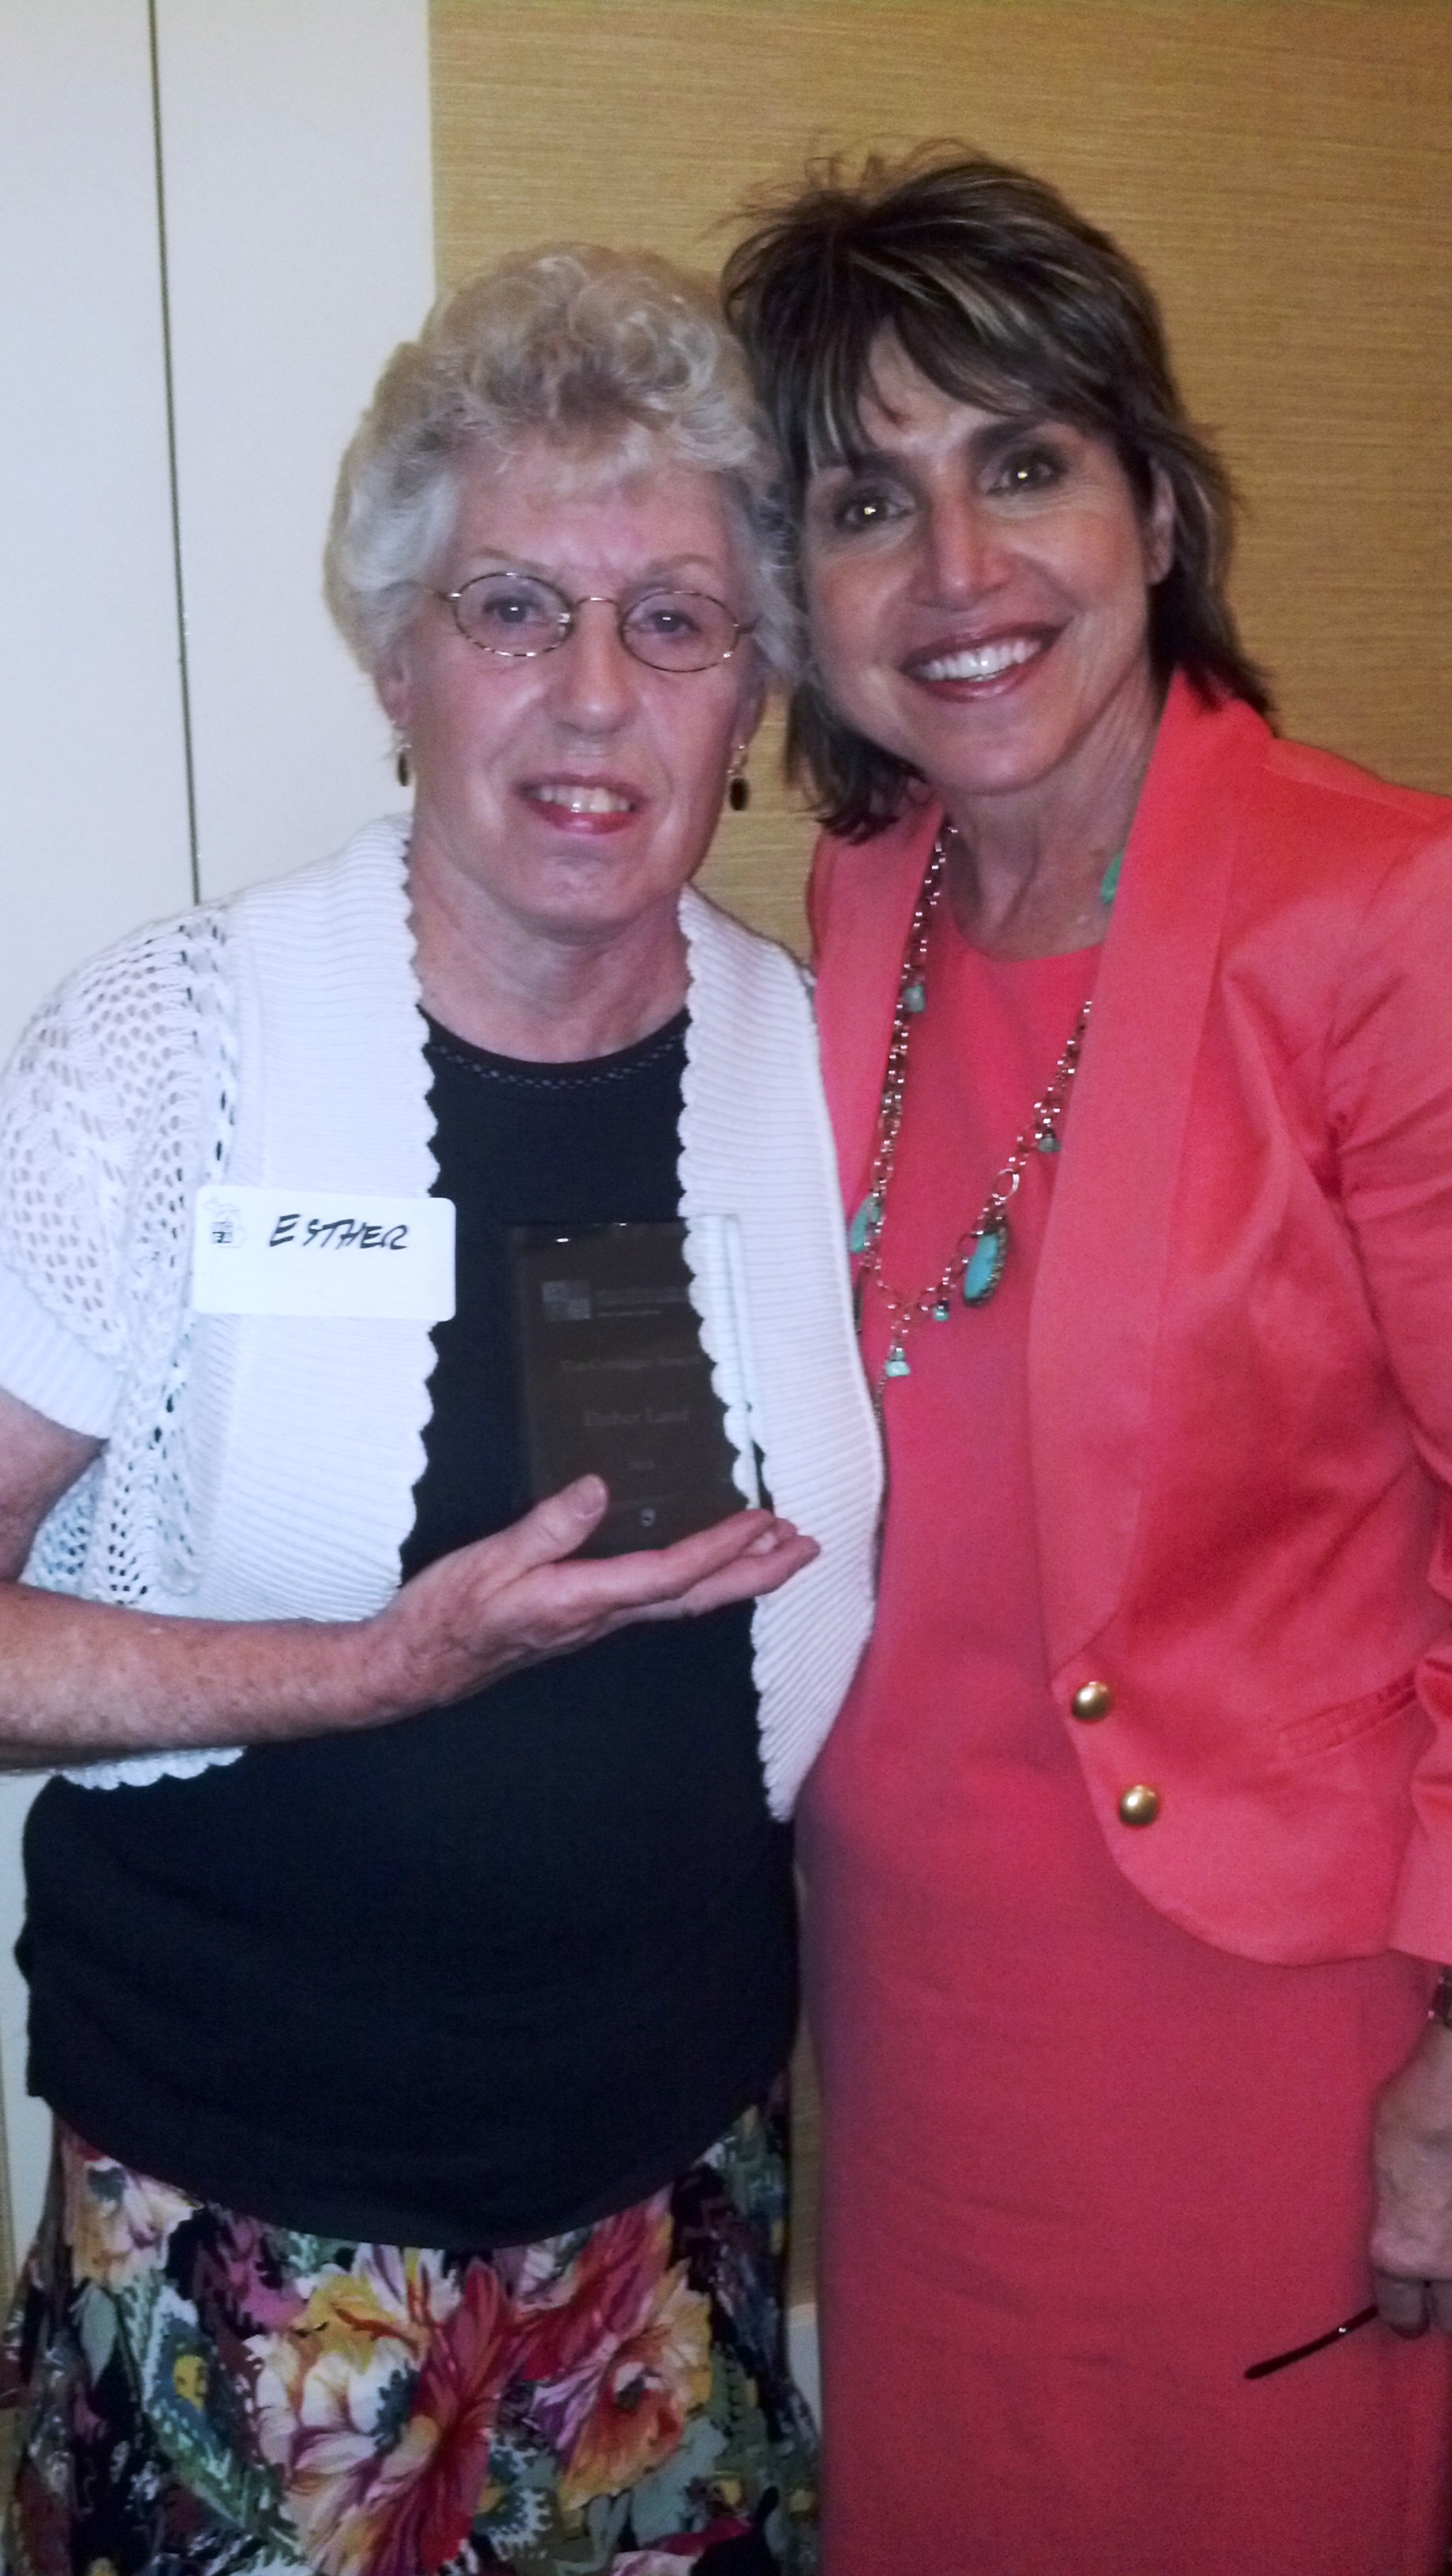 2013 Coraggio Award Winner Esther Land